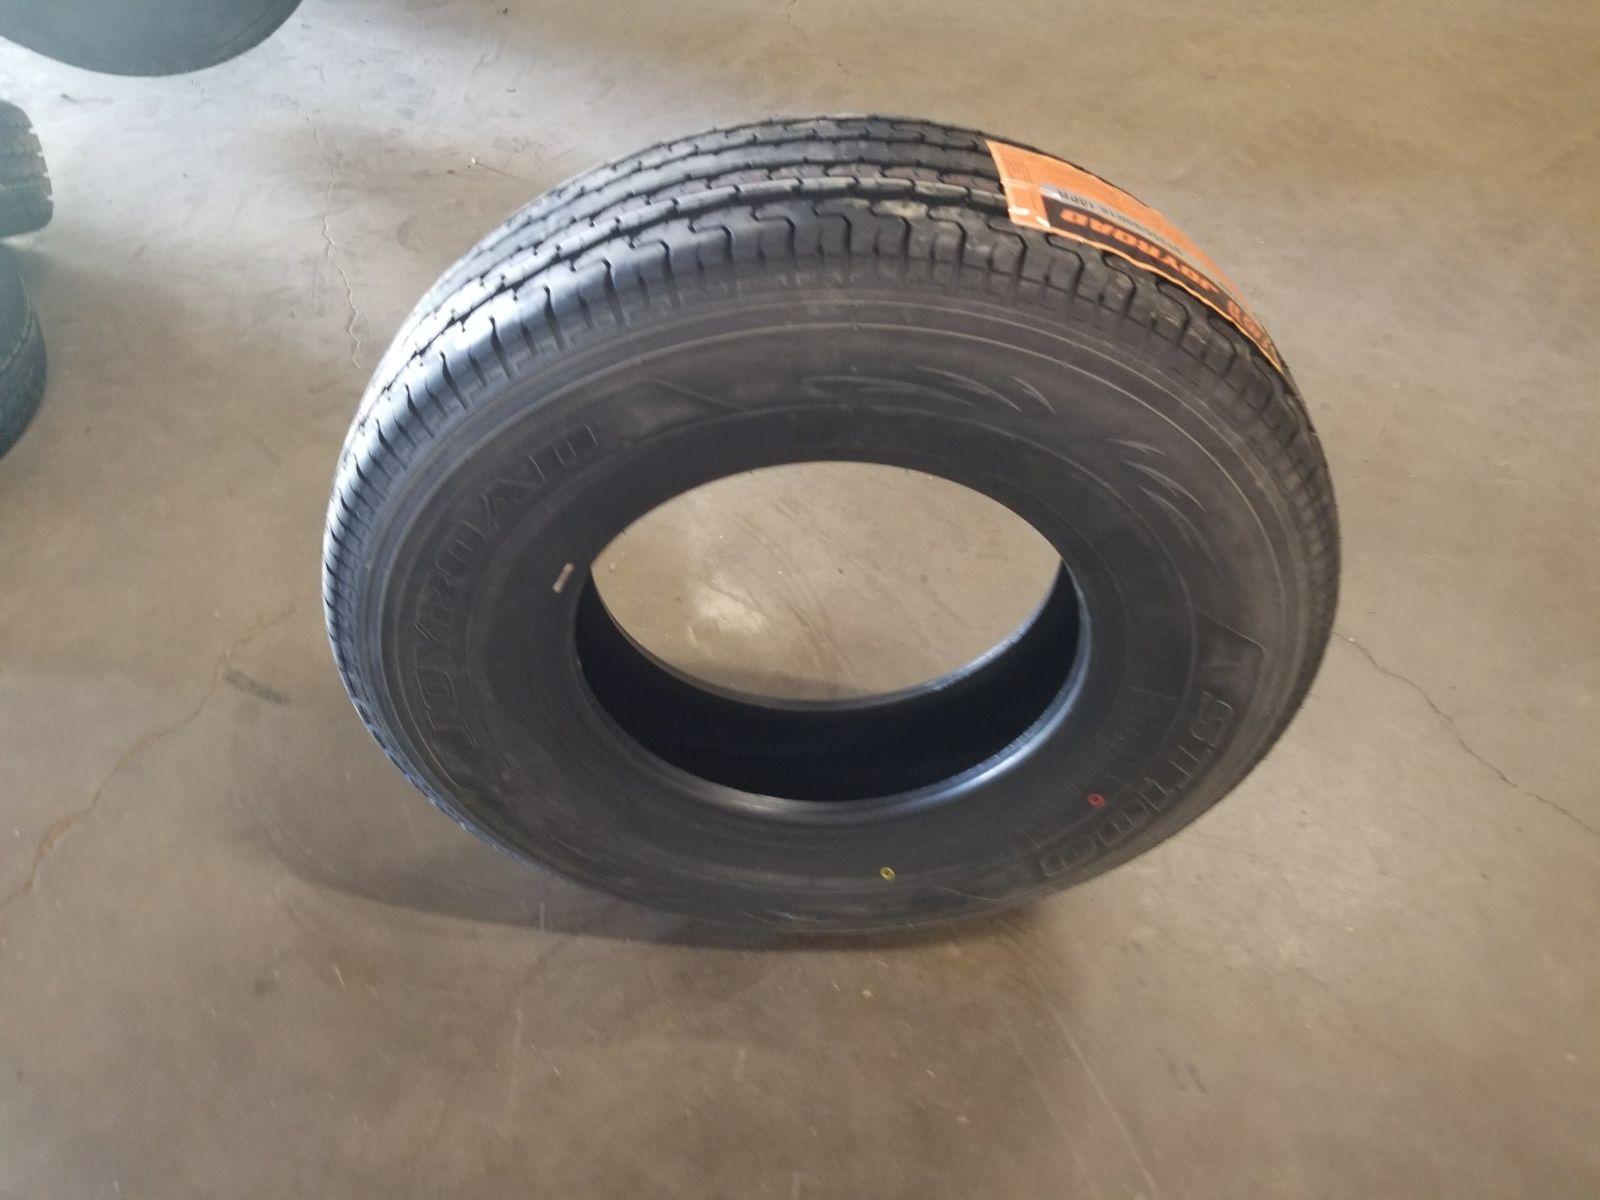 New Trailer Tires Radial 235 85r16 235 80r16 225 75r15 205 75r15 205